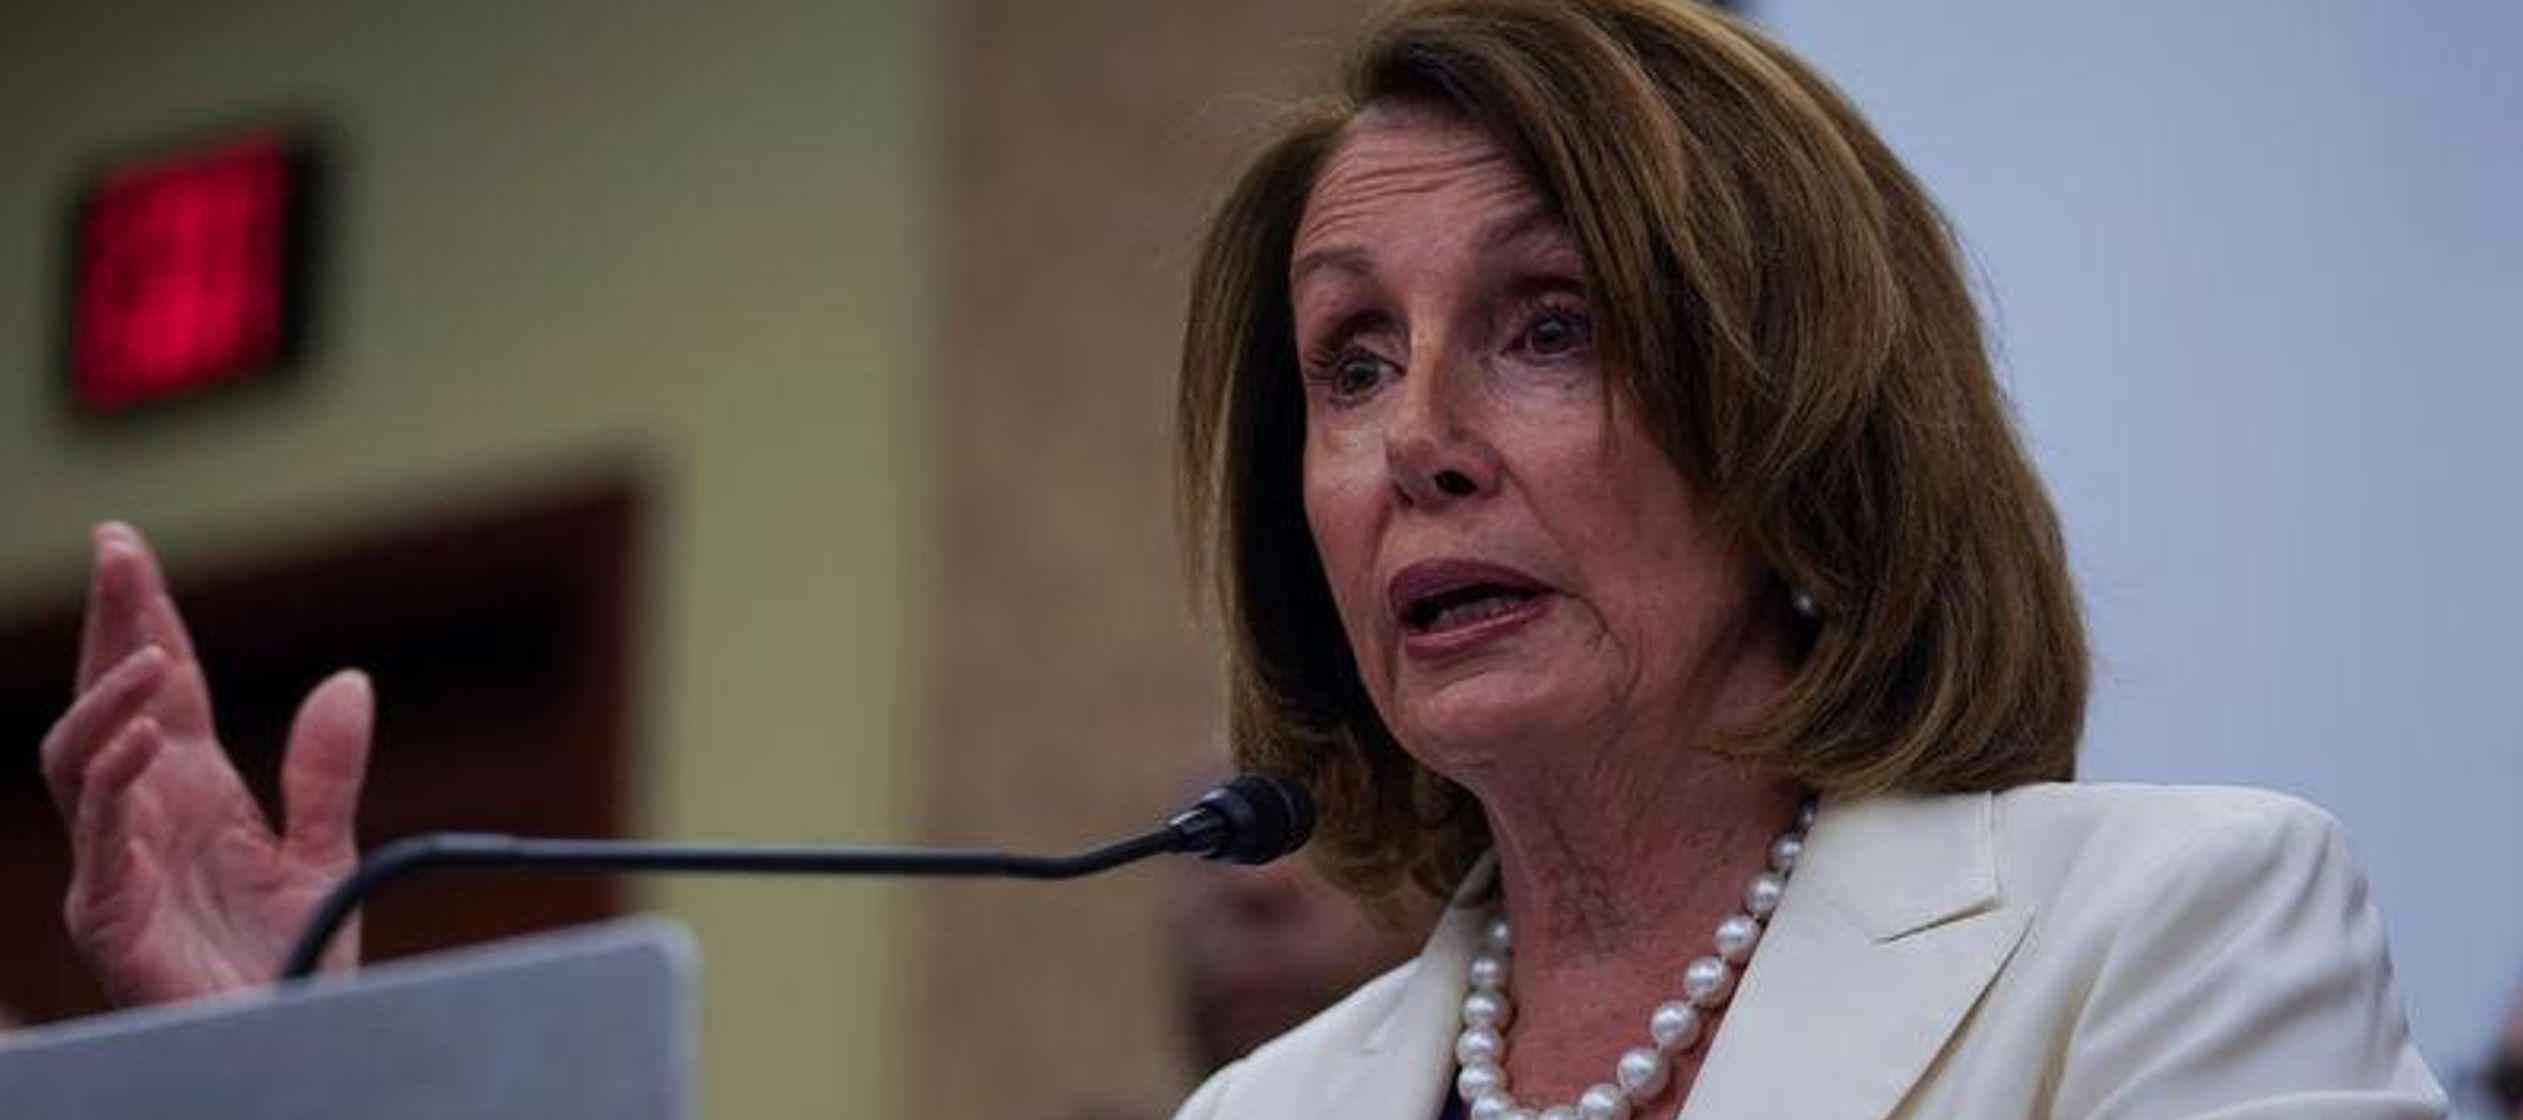 """Creo que debería ser trilateral"", dijo Pelosi a periodistas, y agregó que..."